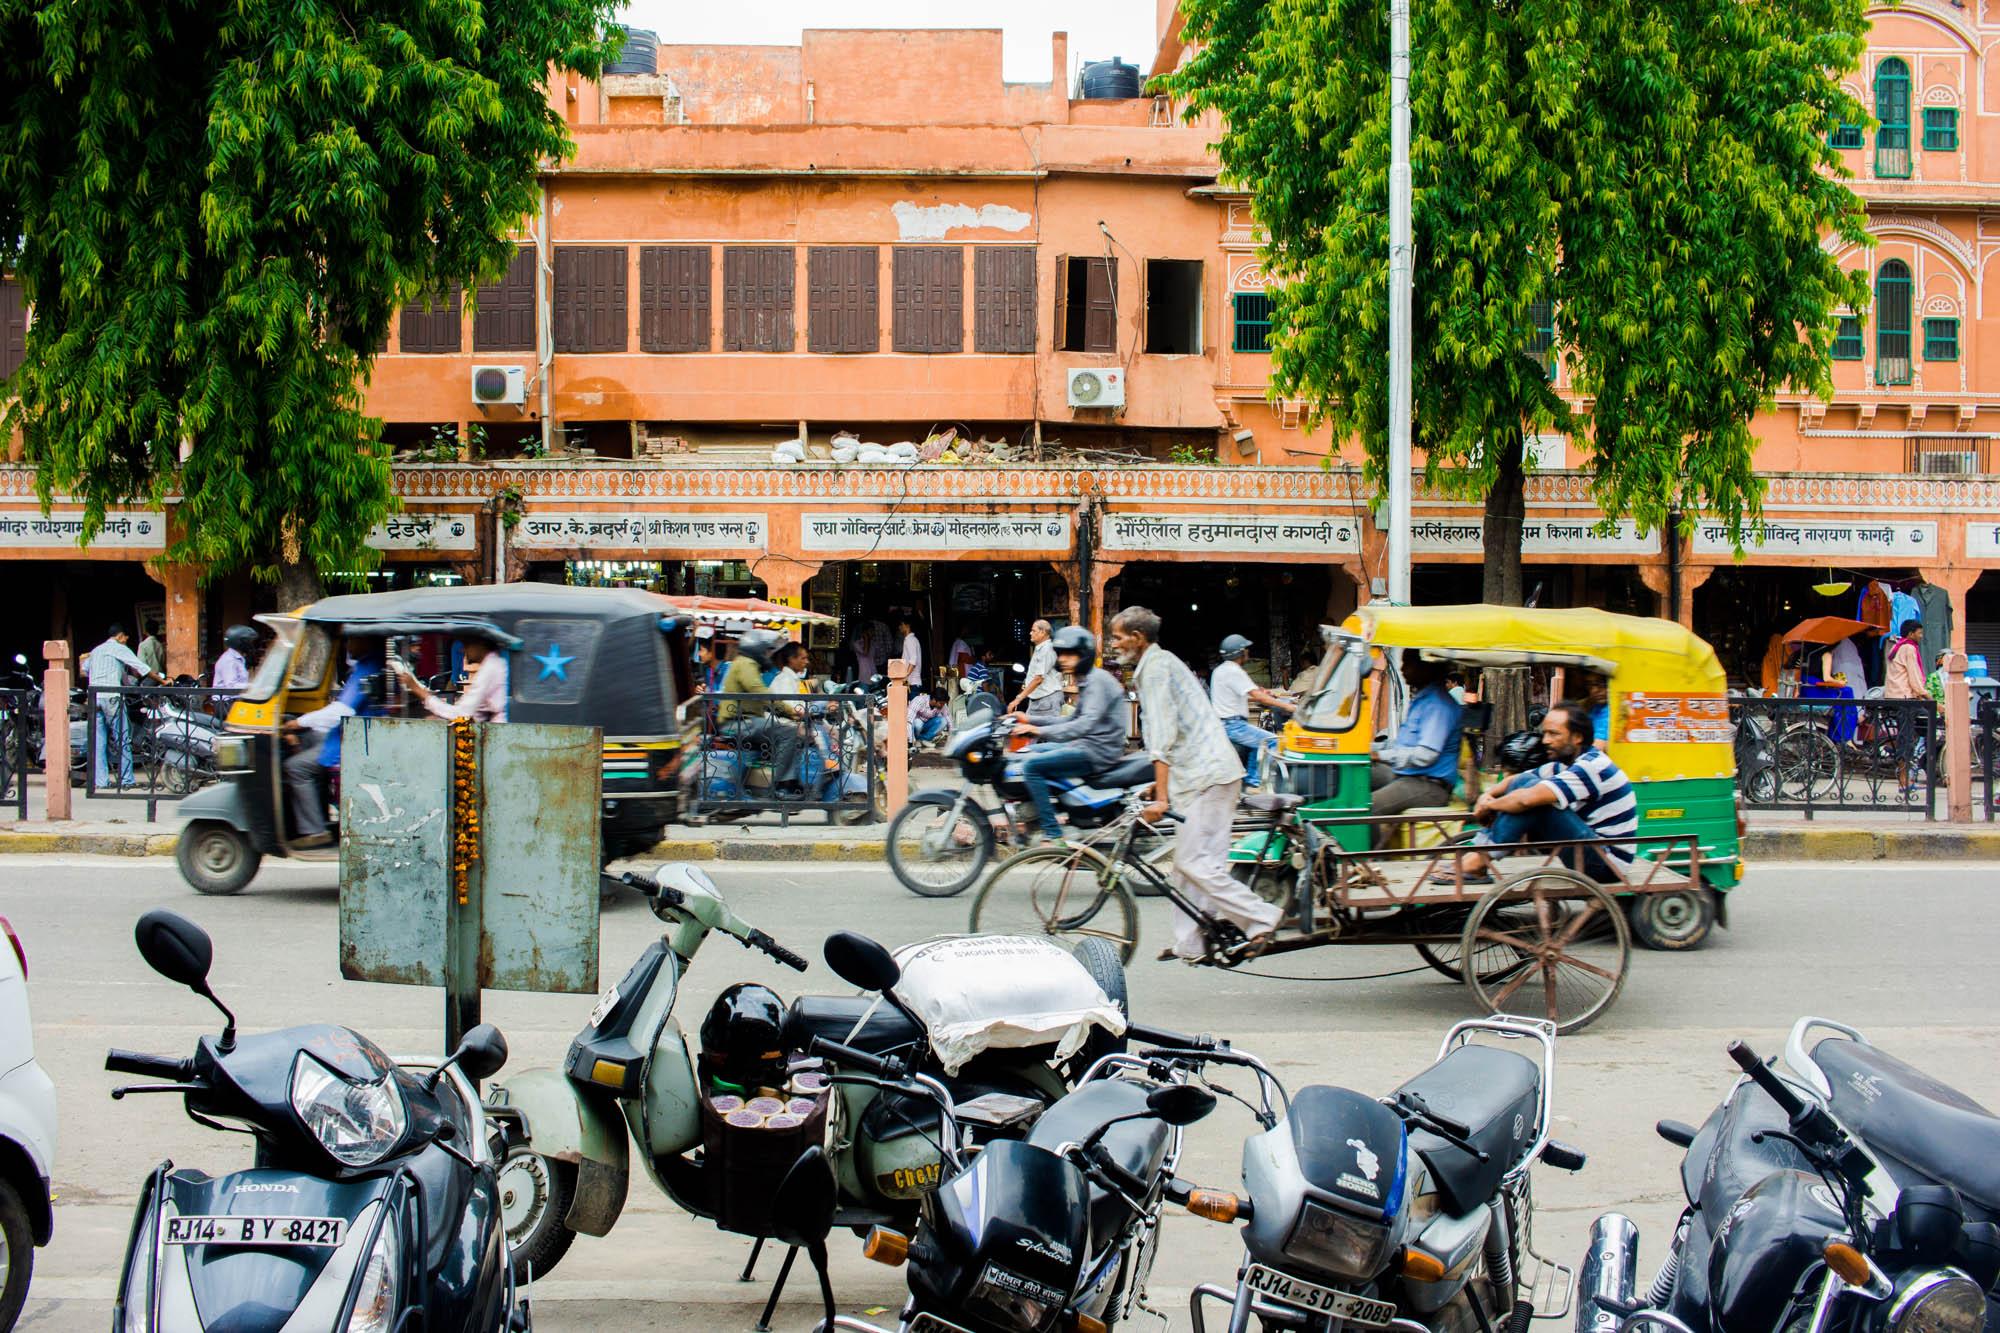 golden triangle rajasthan taj mahal jaipur delhi india tips must see kathi kamleitner travelettes-35